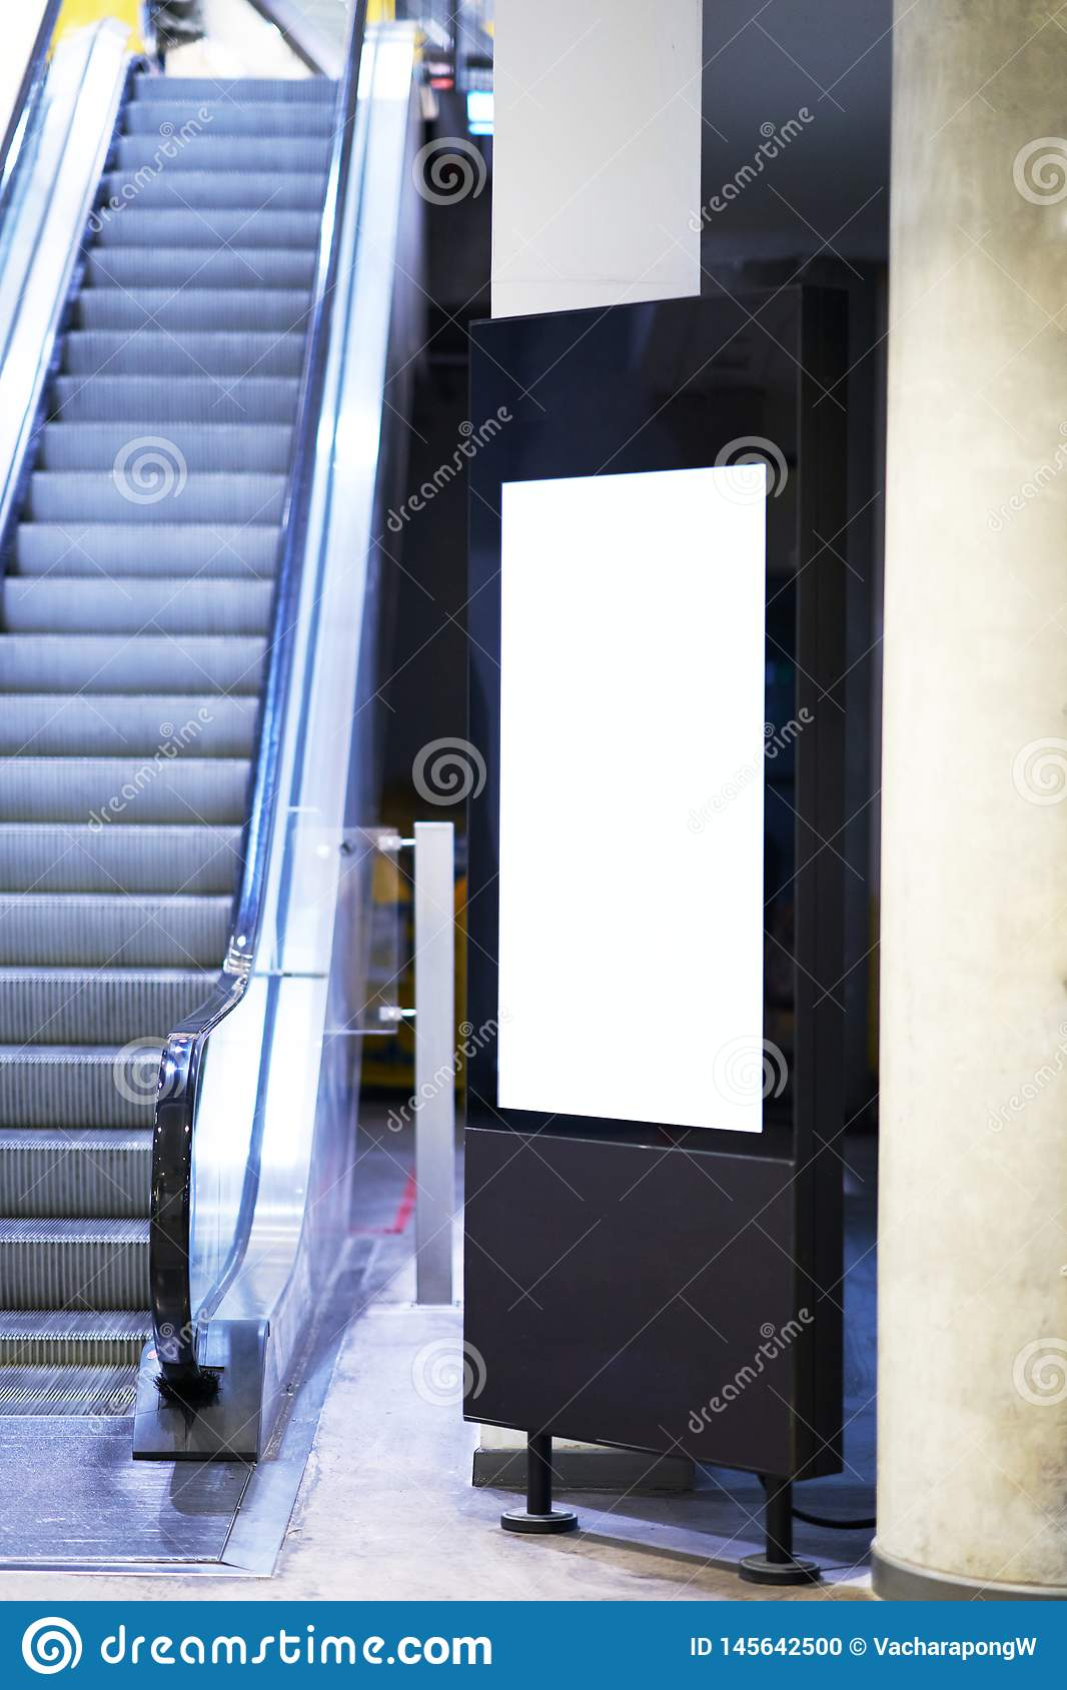 Mock Up Of Light Box Beside Escalator For Advertising Material